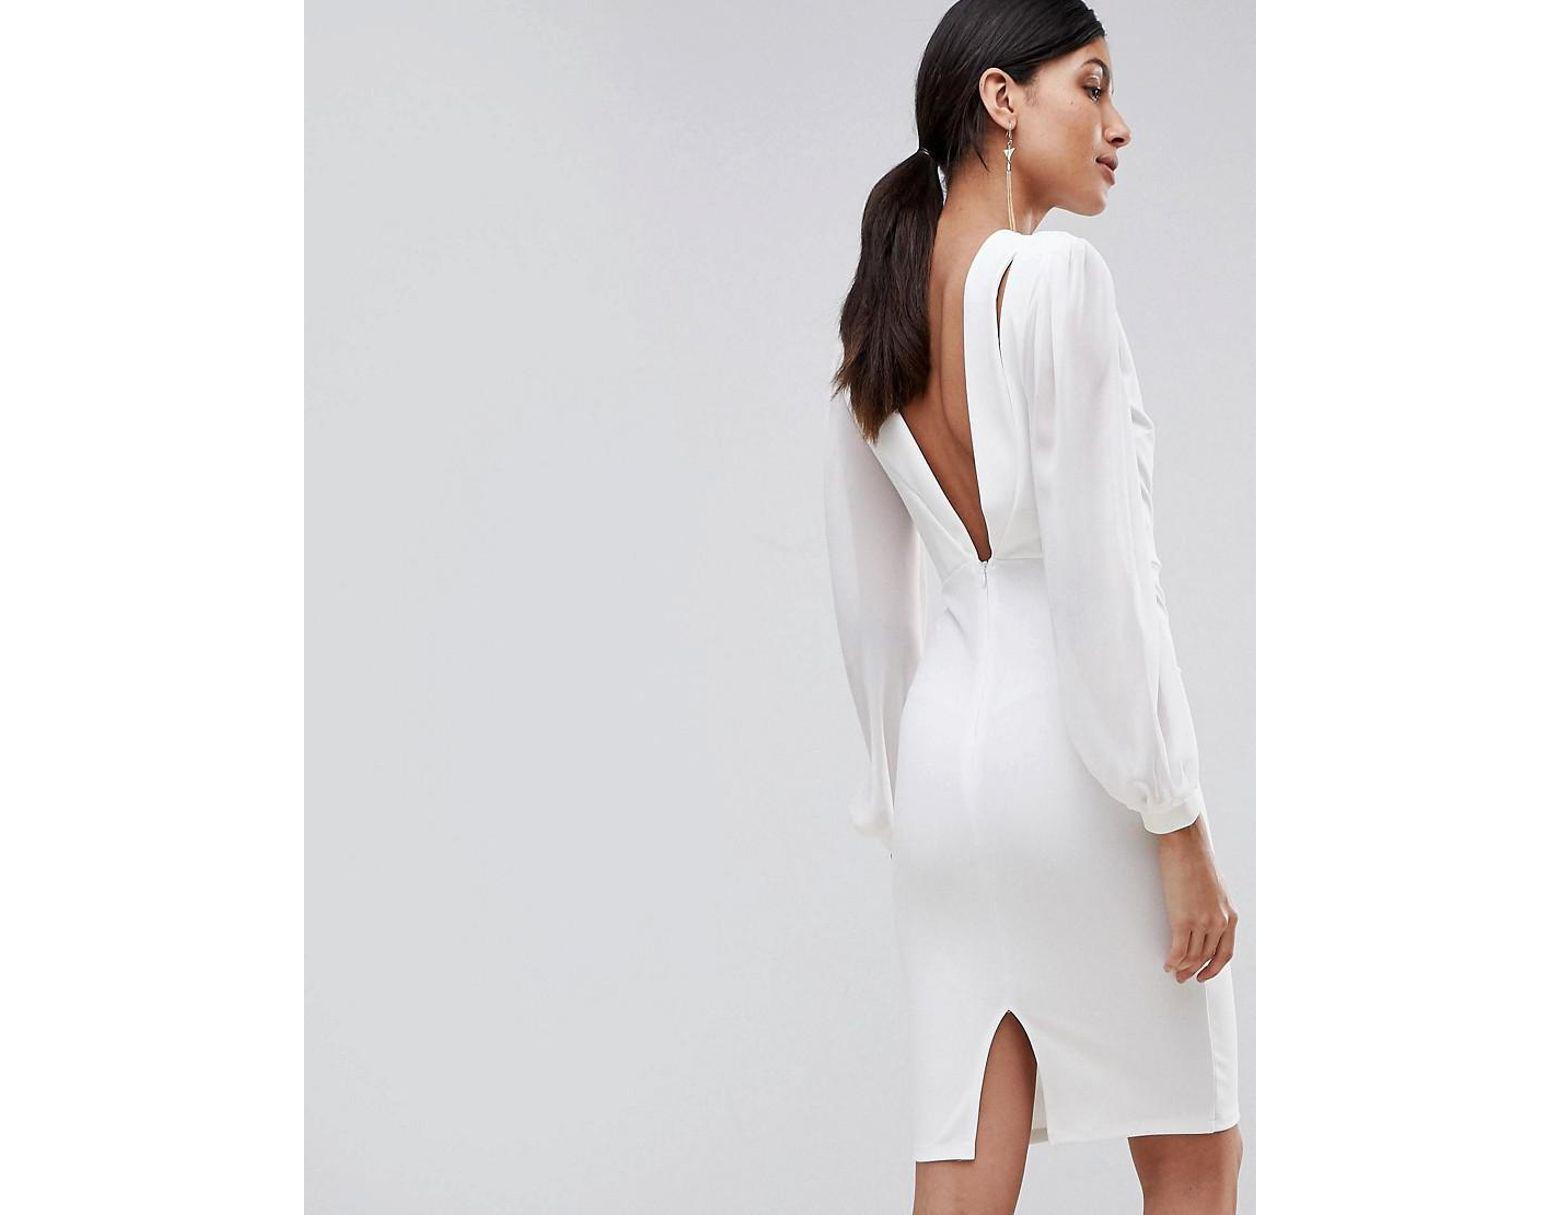 797da9da8d20 John Zack Open Back Bodycon Dress With Split Sleeve Detail in White - Lyst